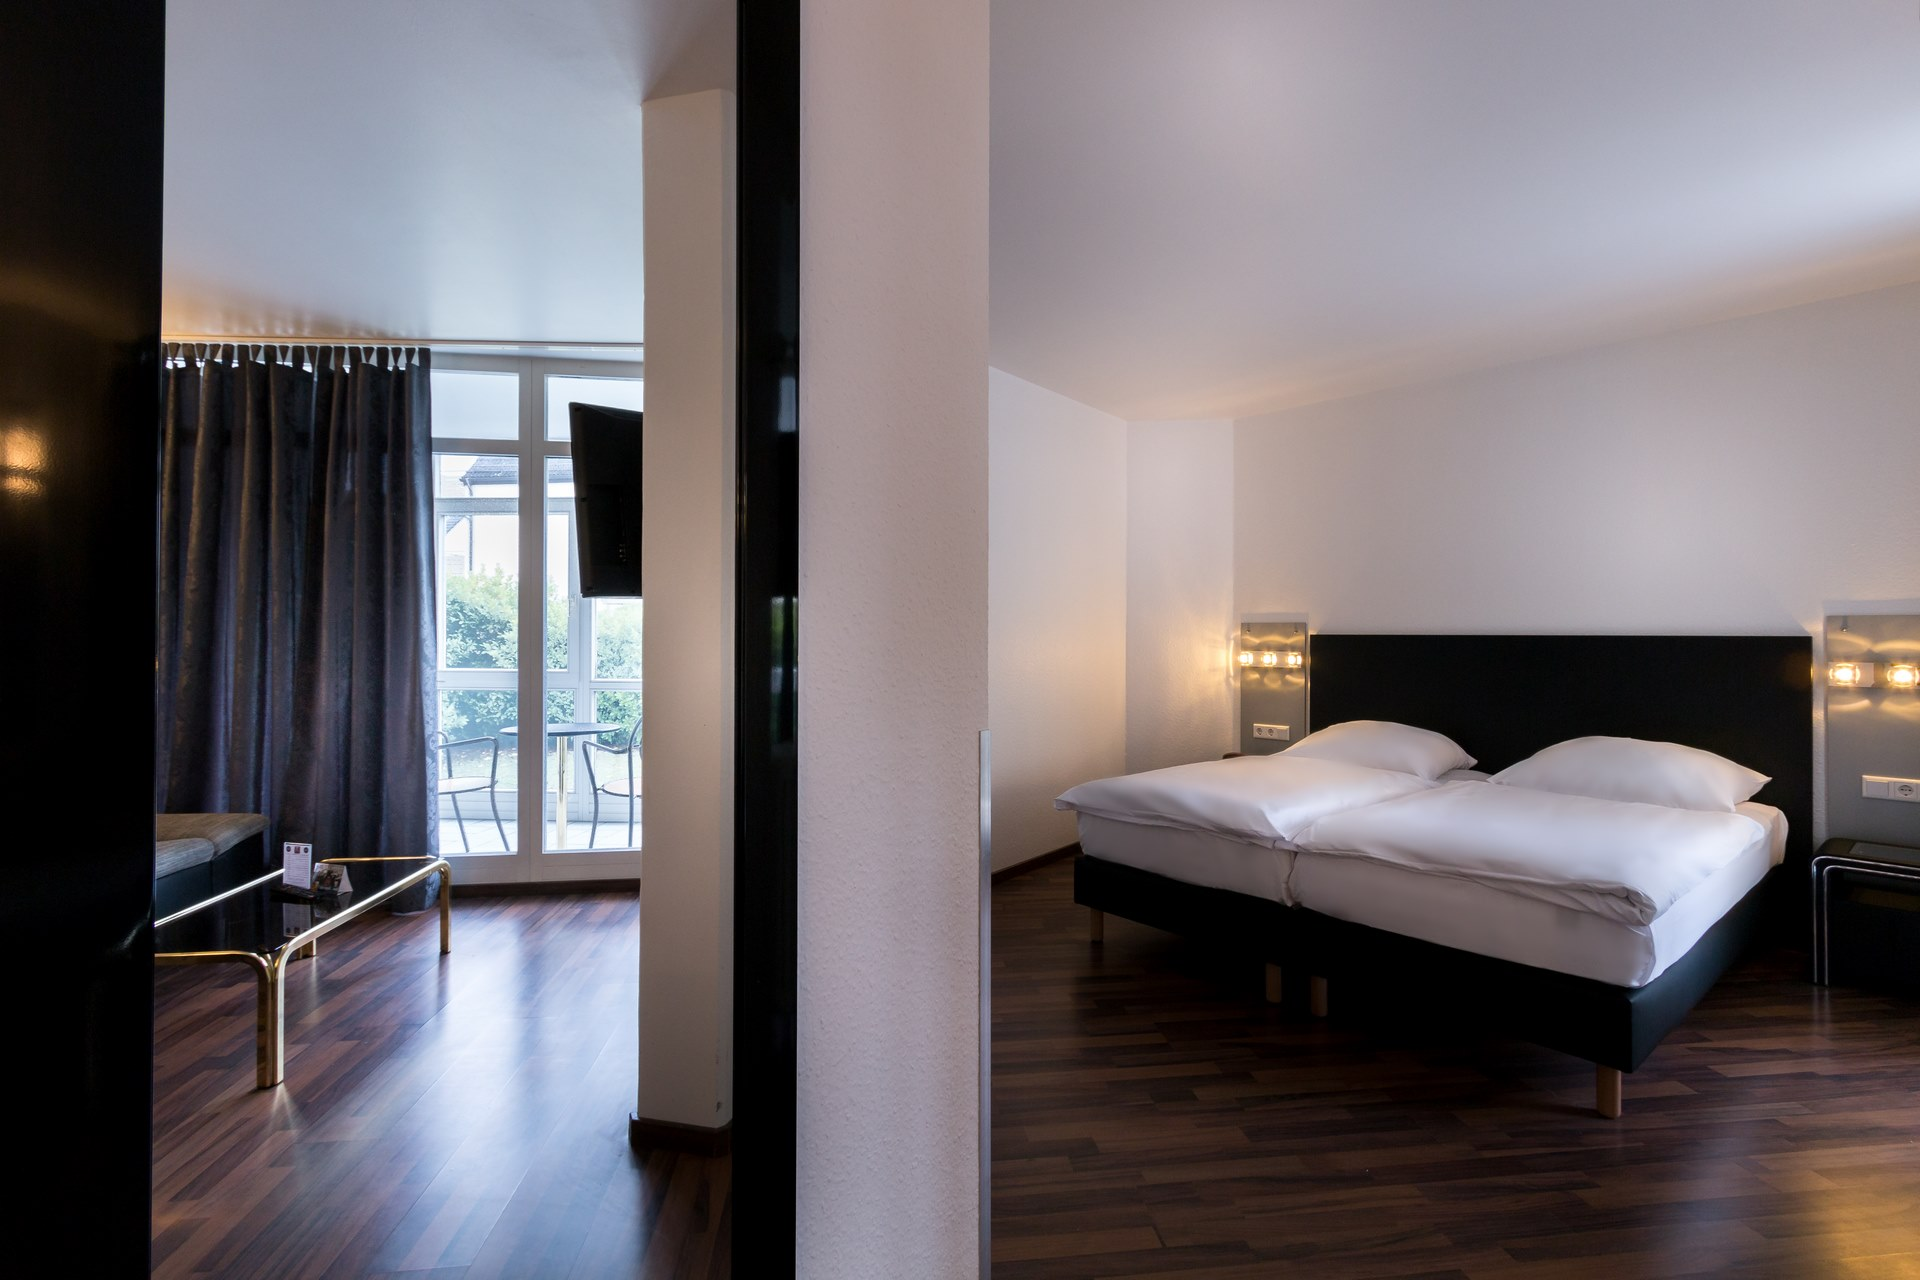 turm-hotel-dreieich-103